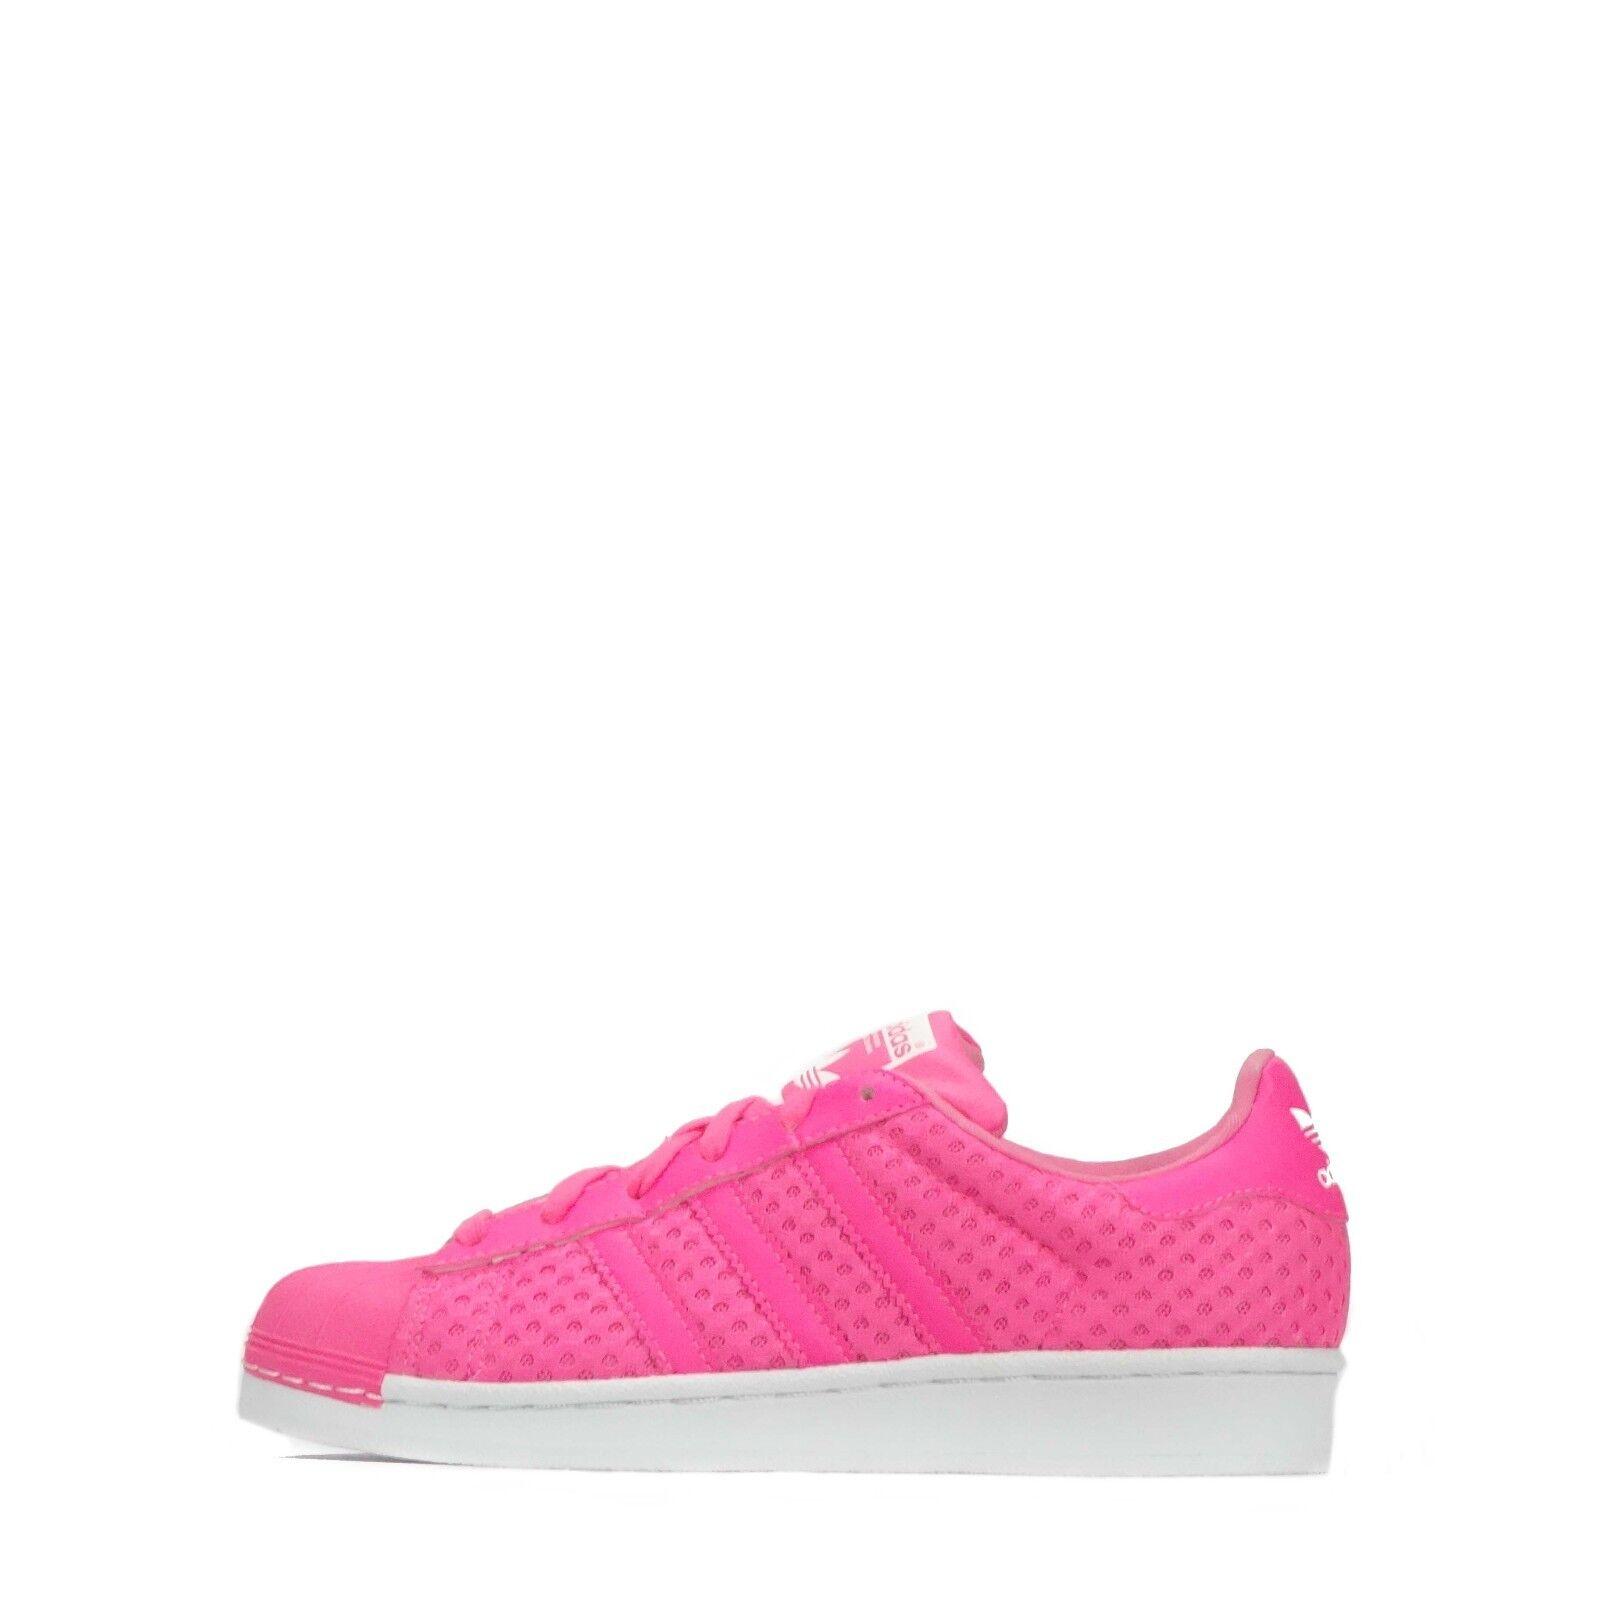 the best attitude 2d622 77cf1 usa adidas originals superstar verano mujer rosa zapatos rosa mujer blanco  o ed6640 ccf57 b6d72